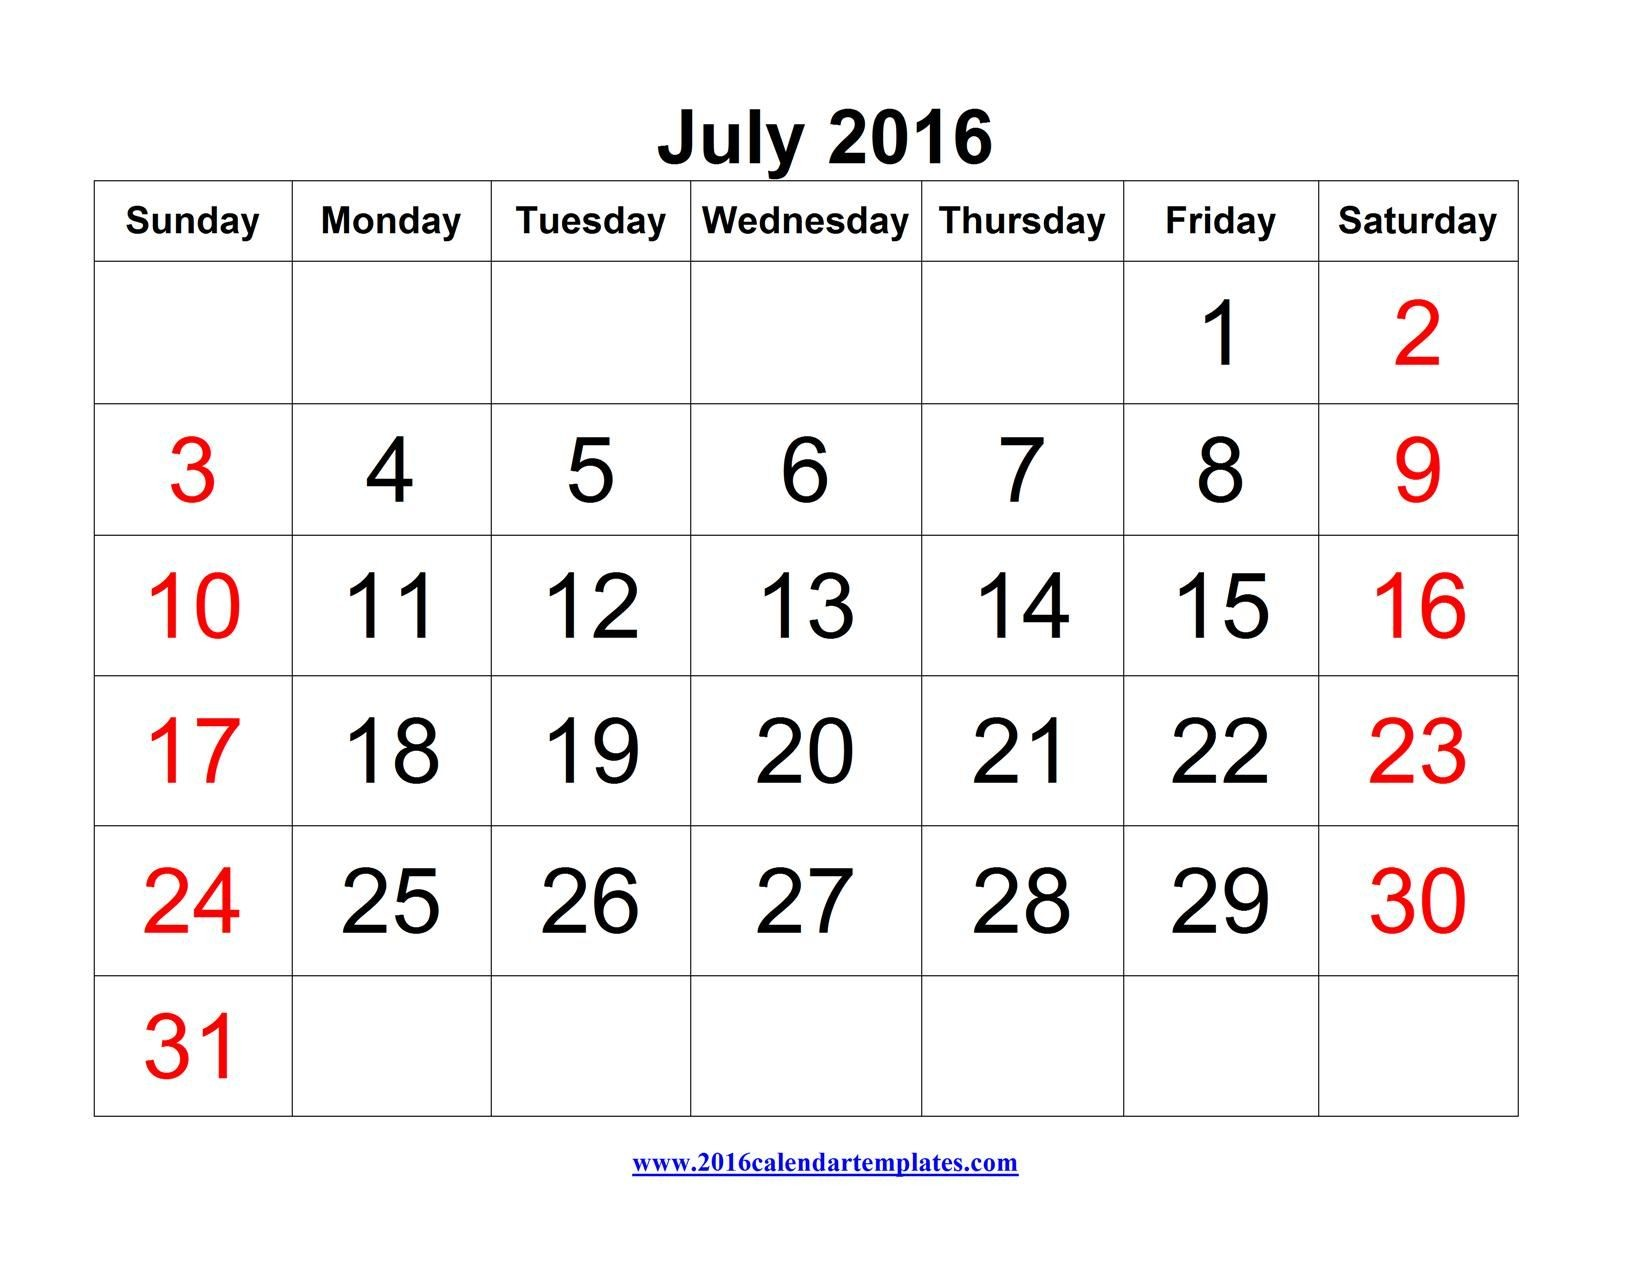 September 2016 Calendar Malayalam · September 2016 Calendar Excel July 2016 Calendar With Holidays